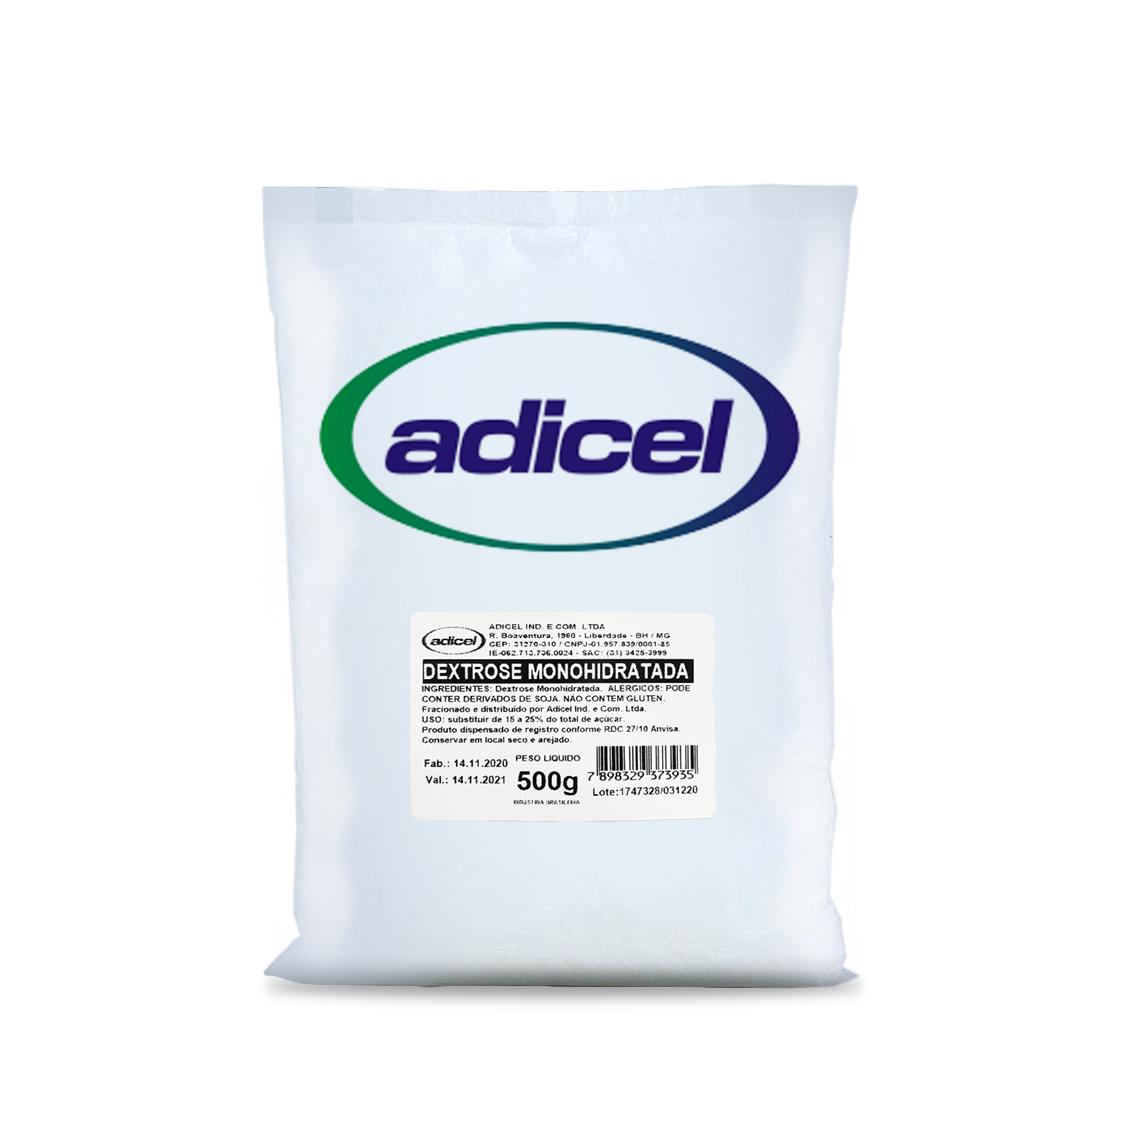 Dextrose Monohidratada - 500g